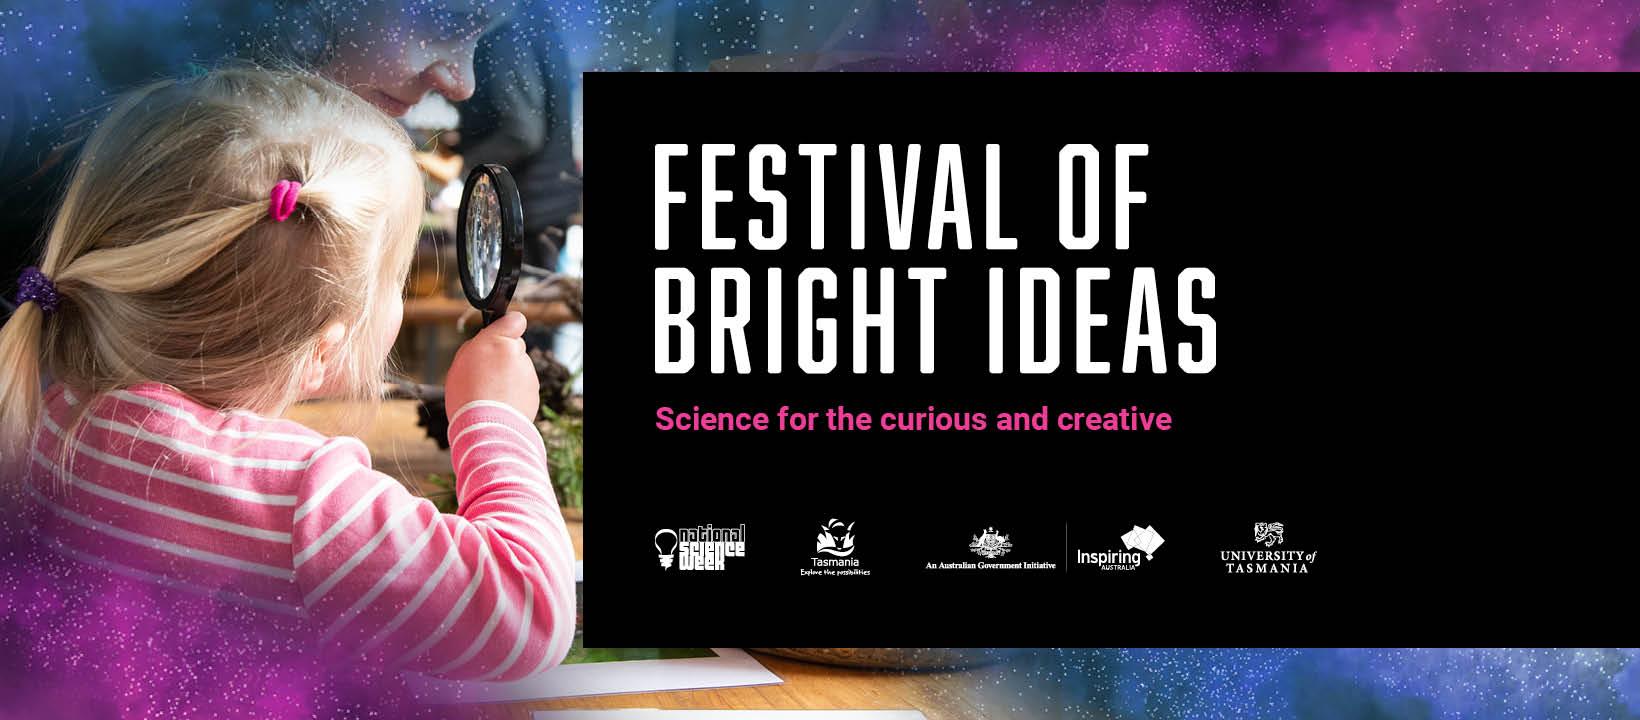 Festival of Bright Ideas - Events | University of Tasmania